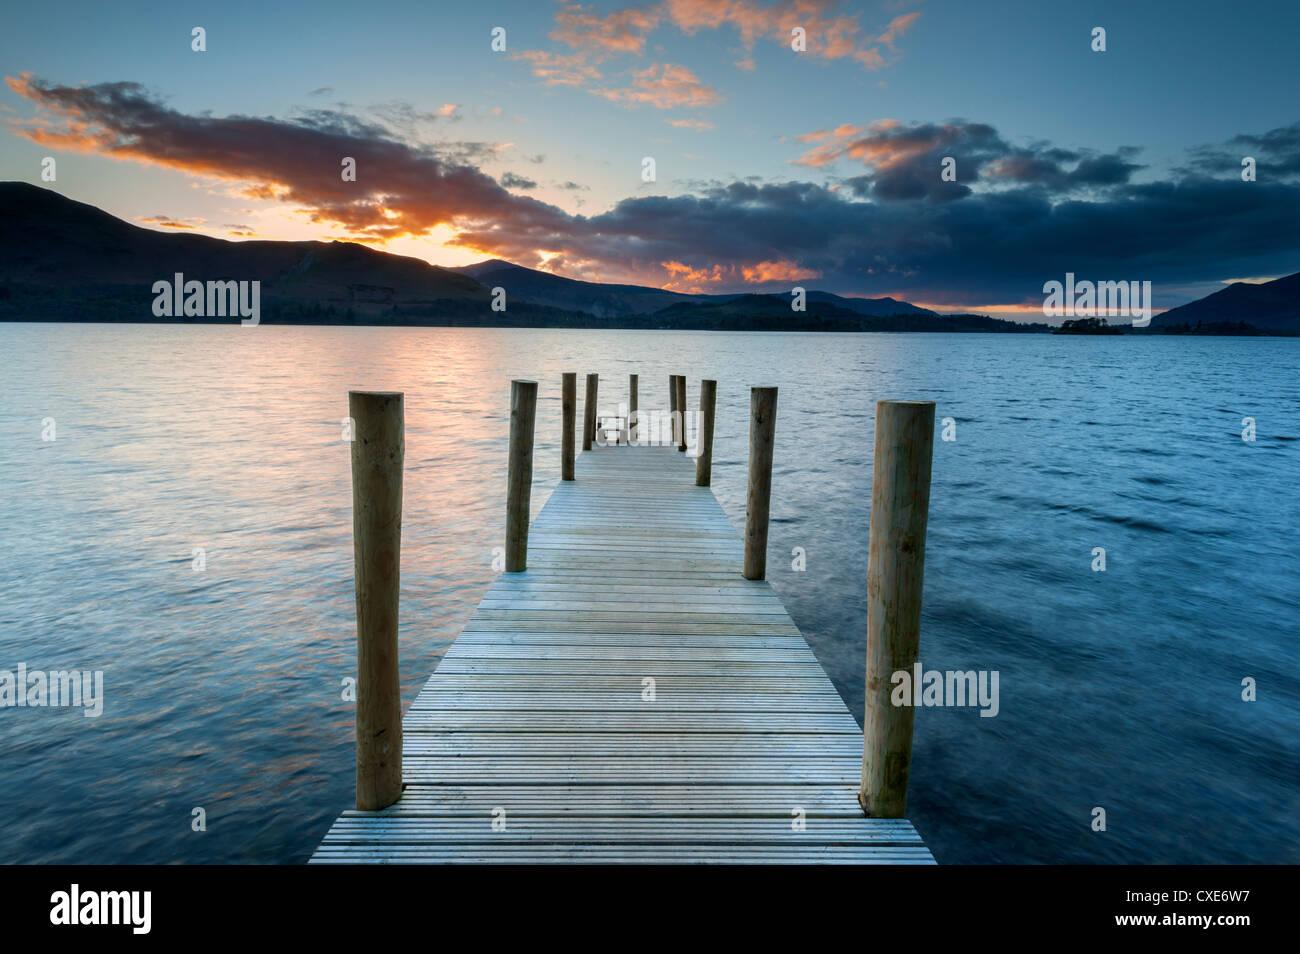 Sunset at Ashness Jetty, Barrow Bay, Derwent Water, Keswick, Lake District National Park, Cumbria, England - Stock Image